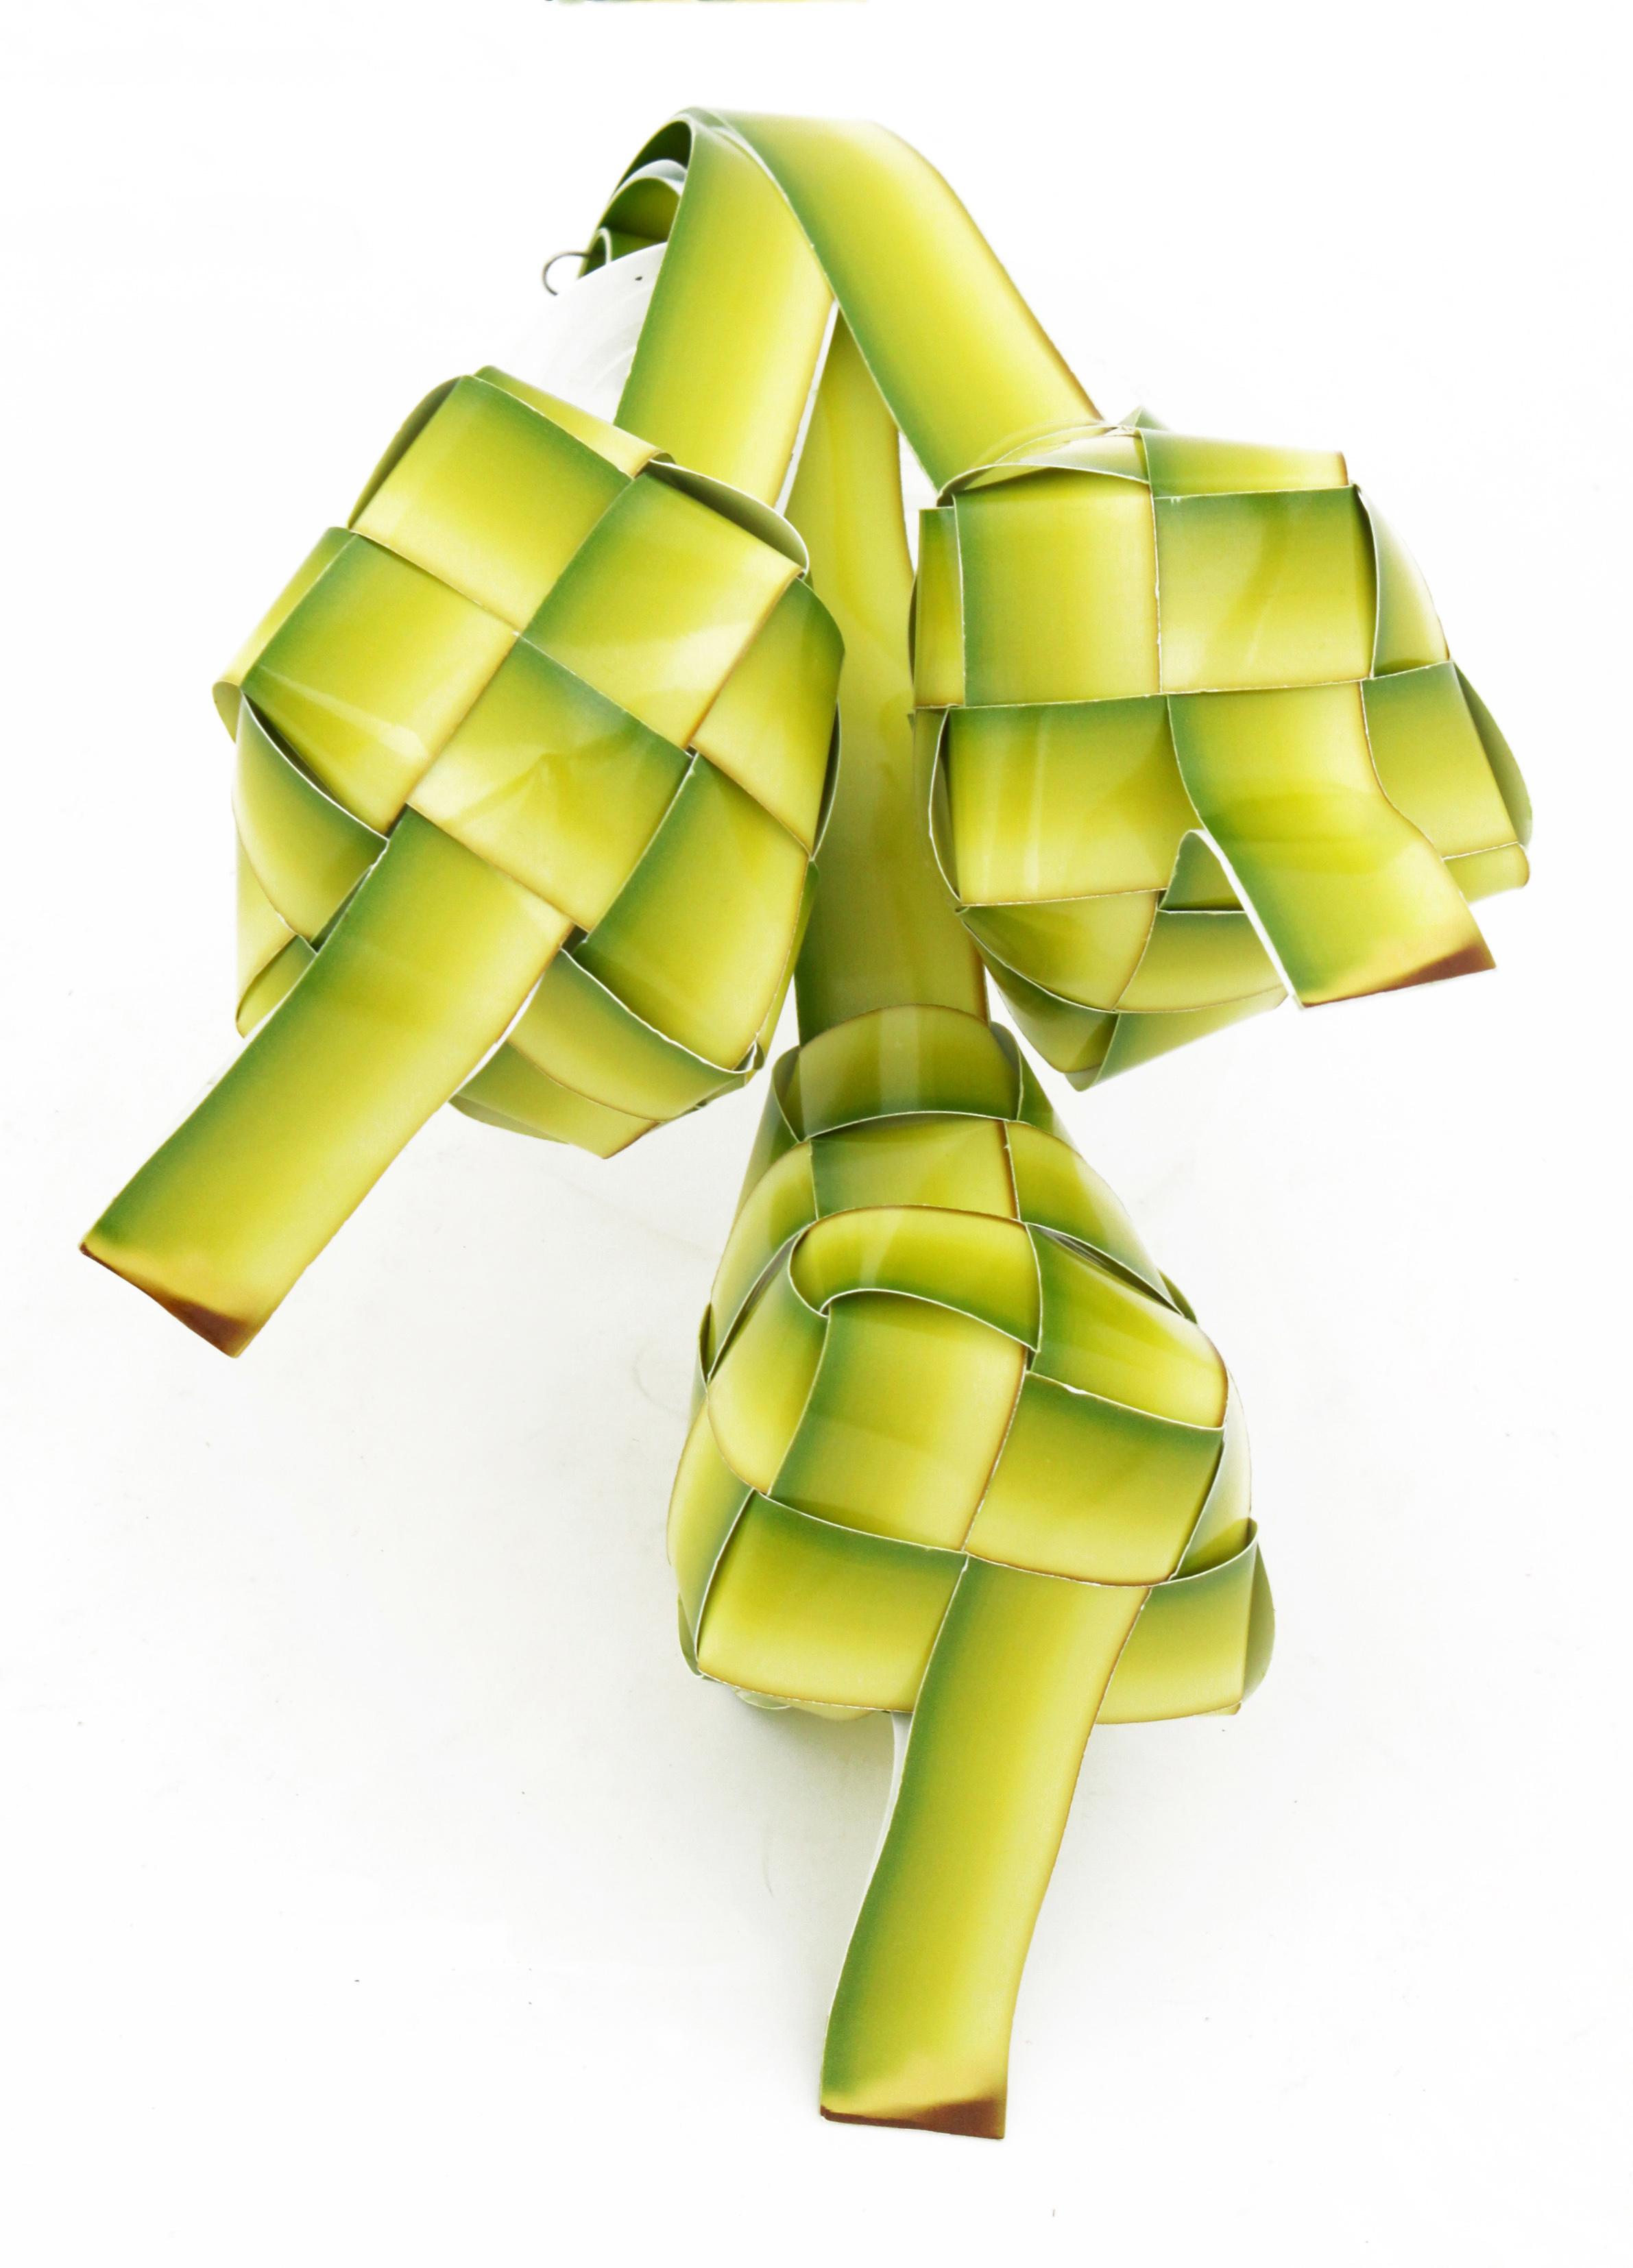 2382x3308 Filedrawing Of Three Ketupat